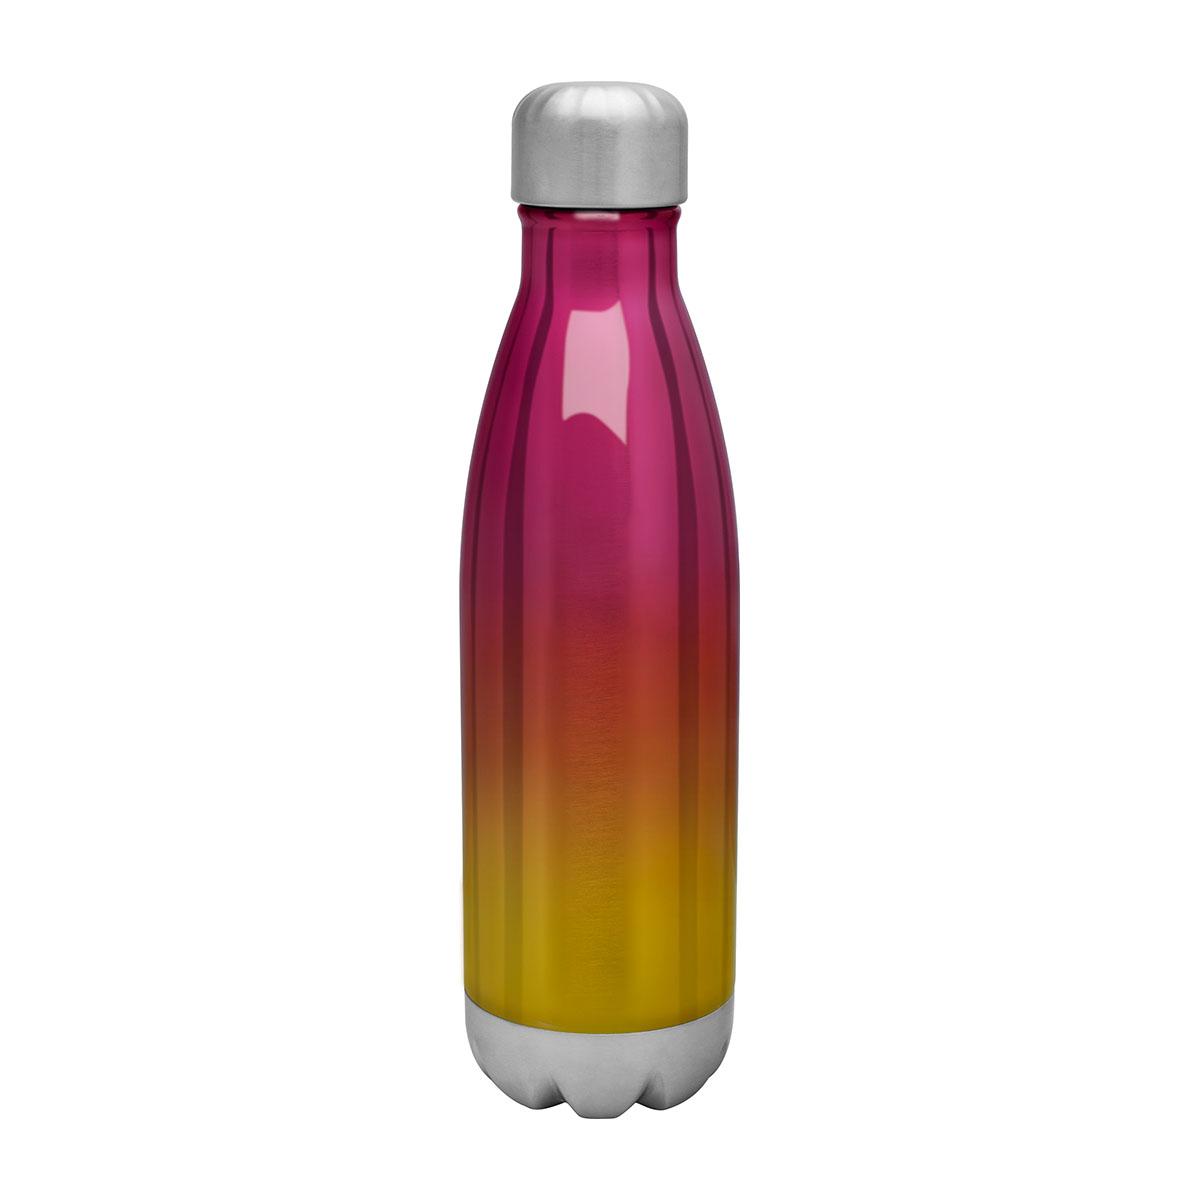 Dawn ombre bottle